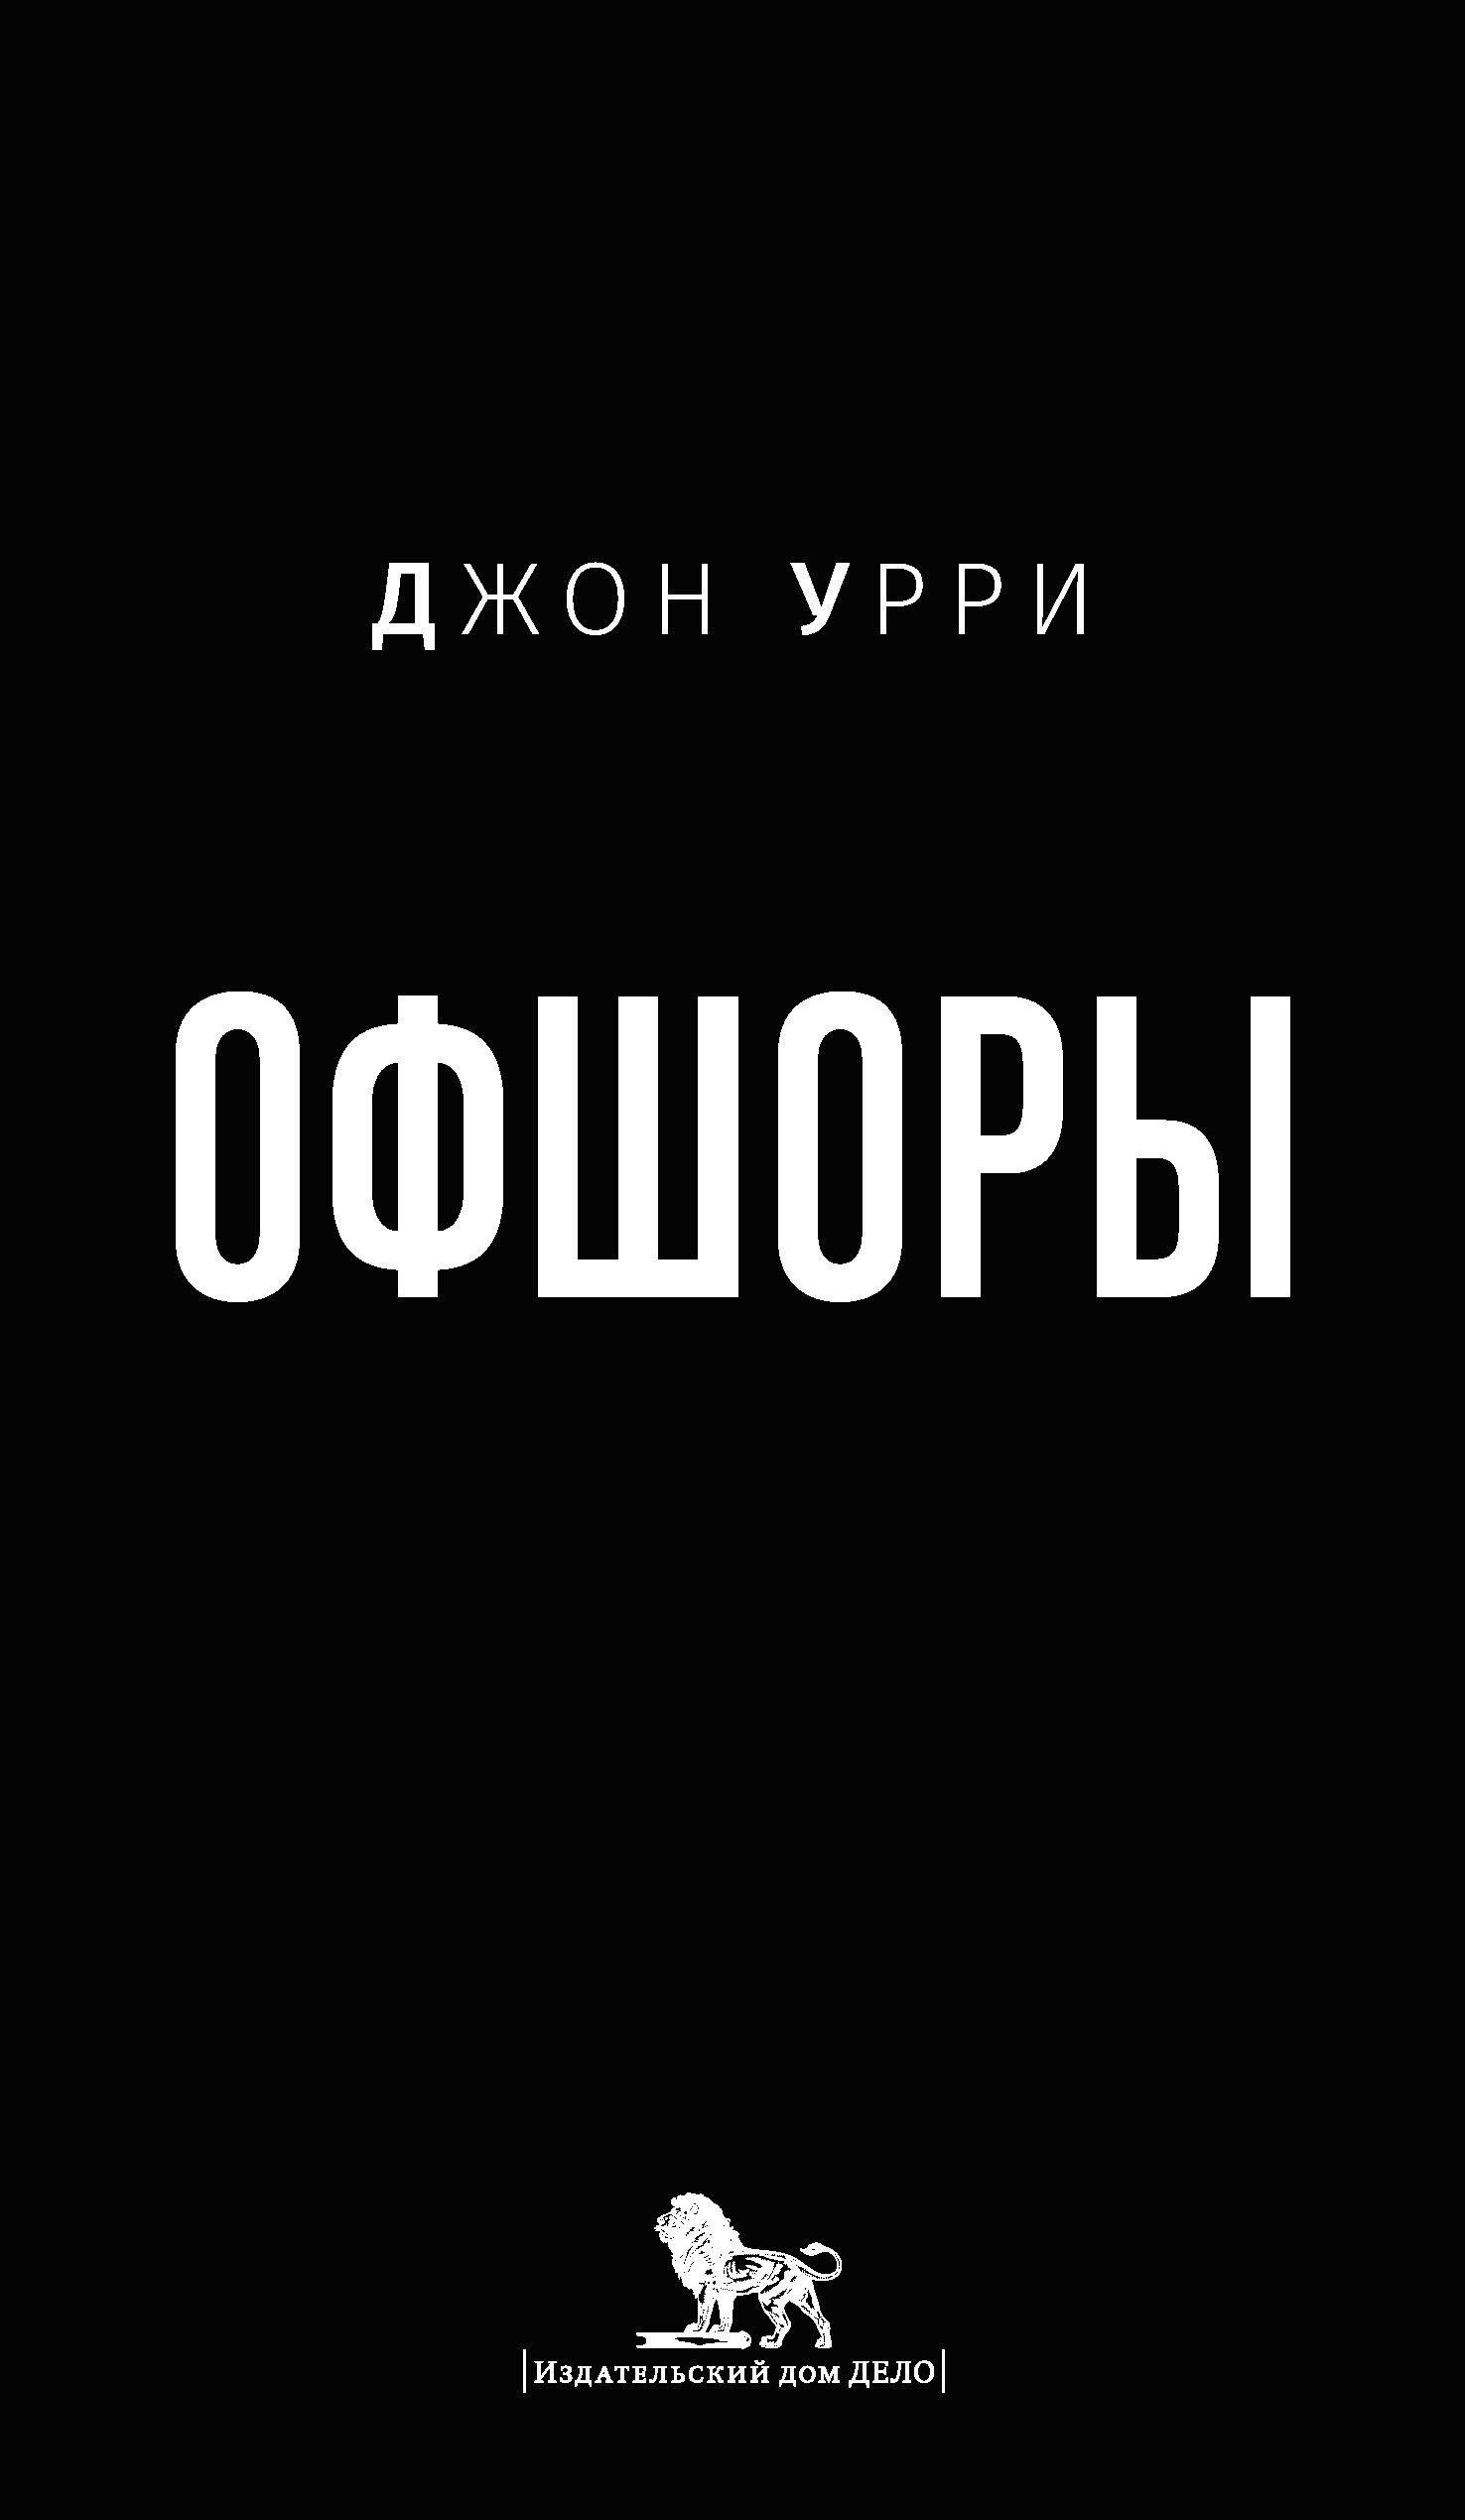 Джон Урри - Офшоры